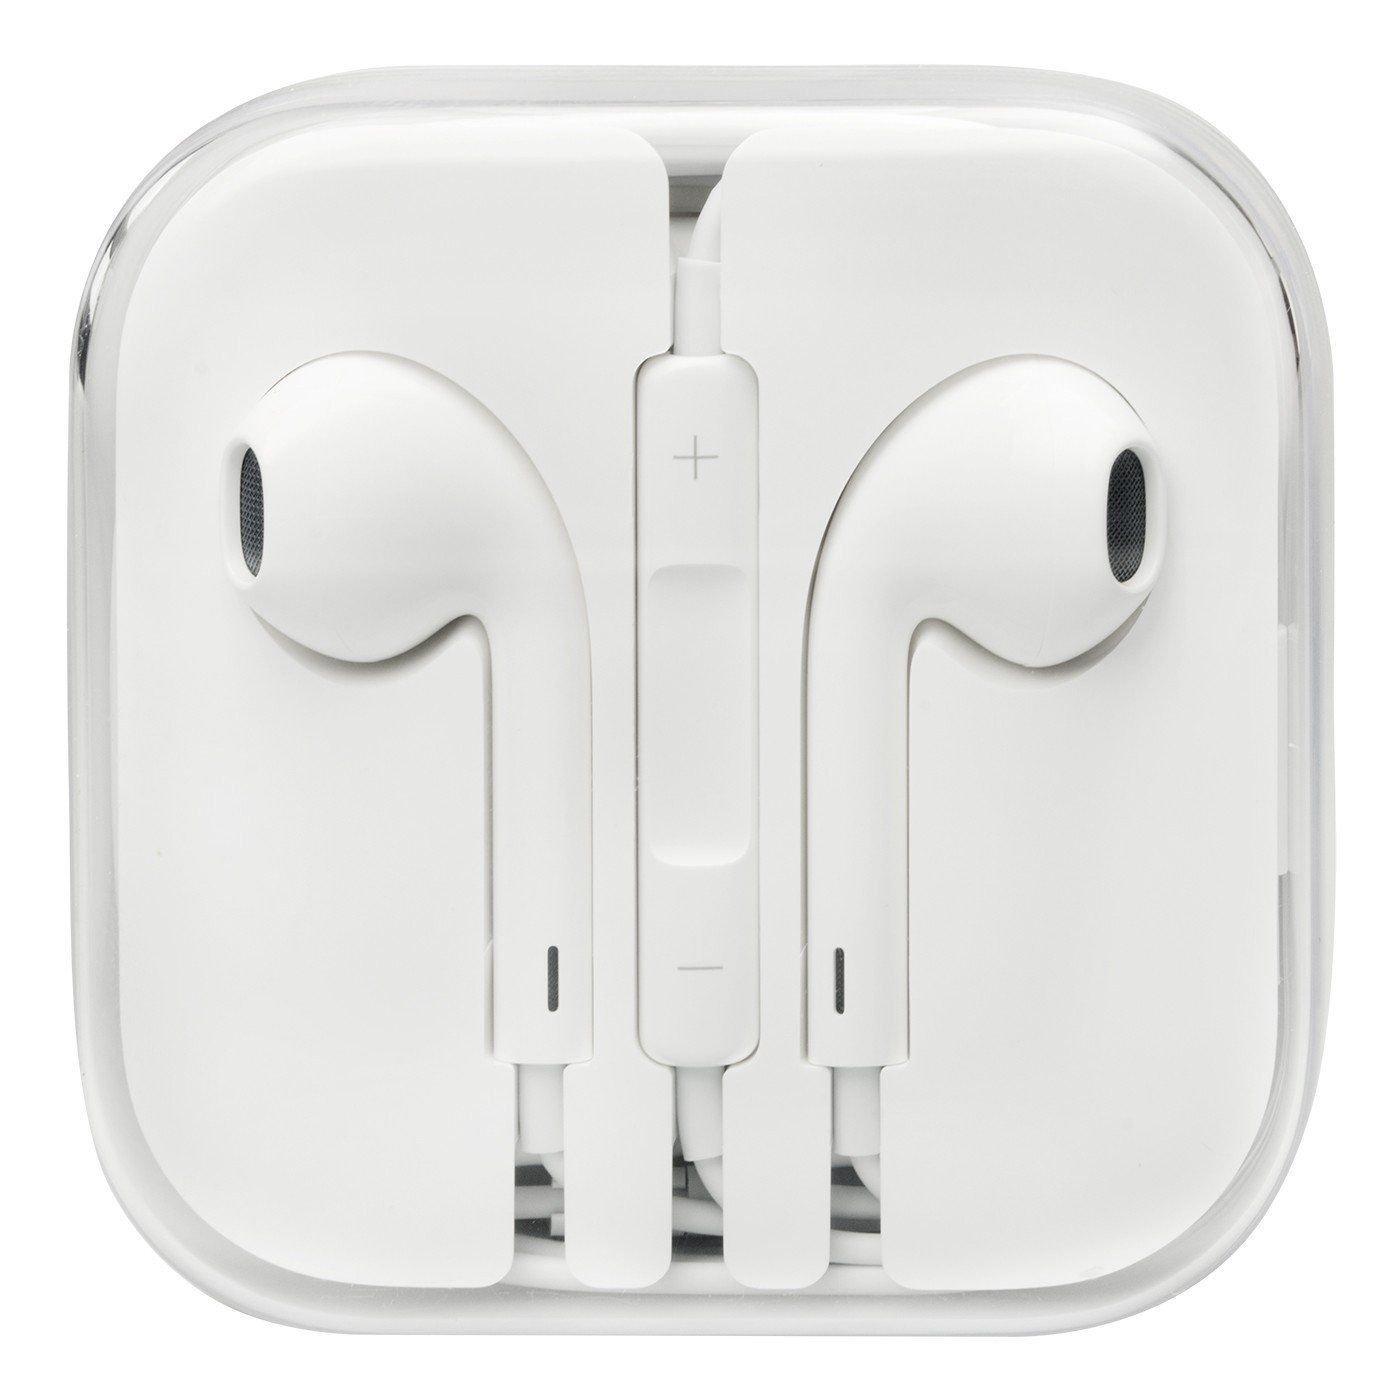 Apple Mac Iphone Ipad Ipod Itunes Precios Prices Erapod Original Nuevo 5 Earpods In Ea